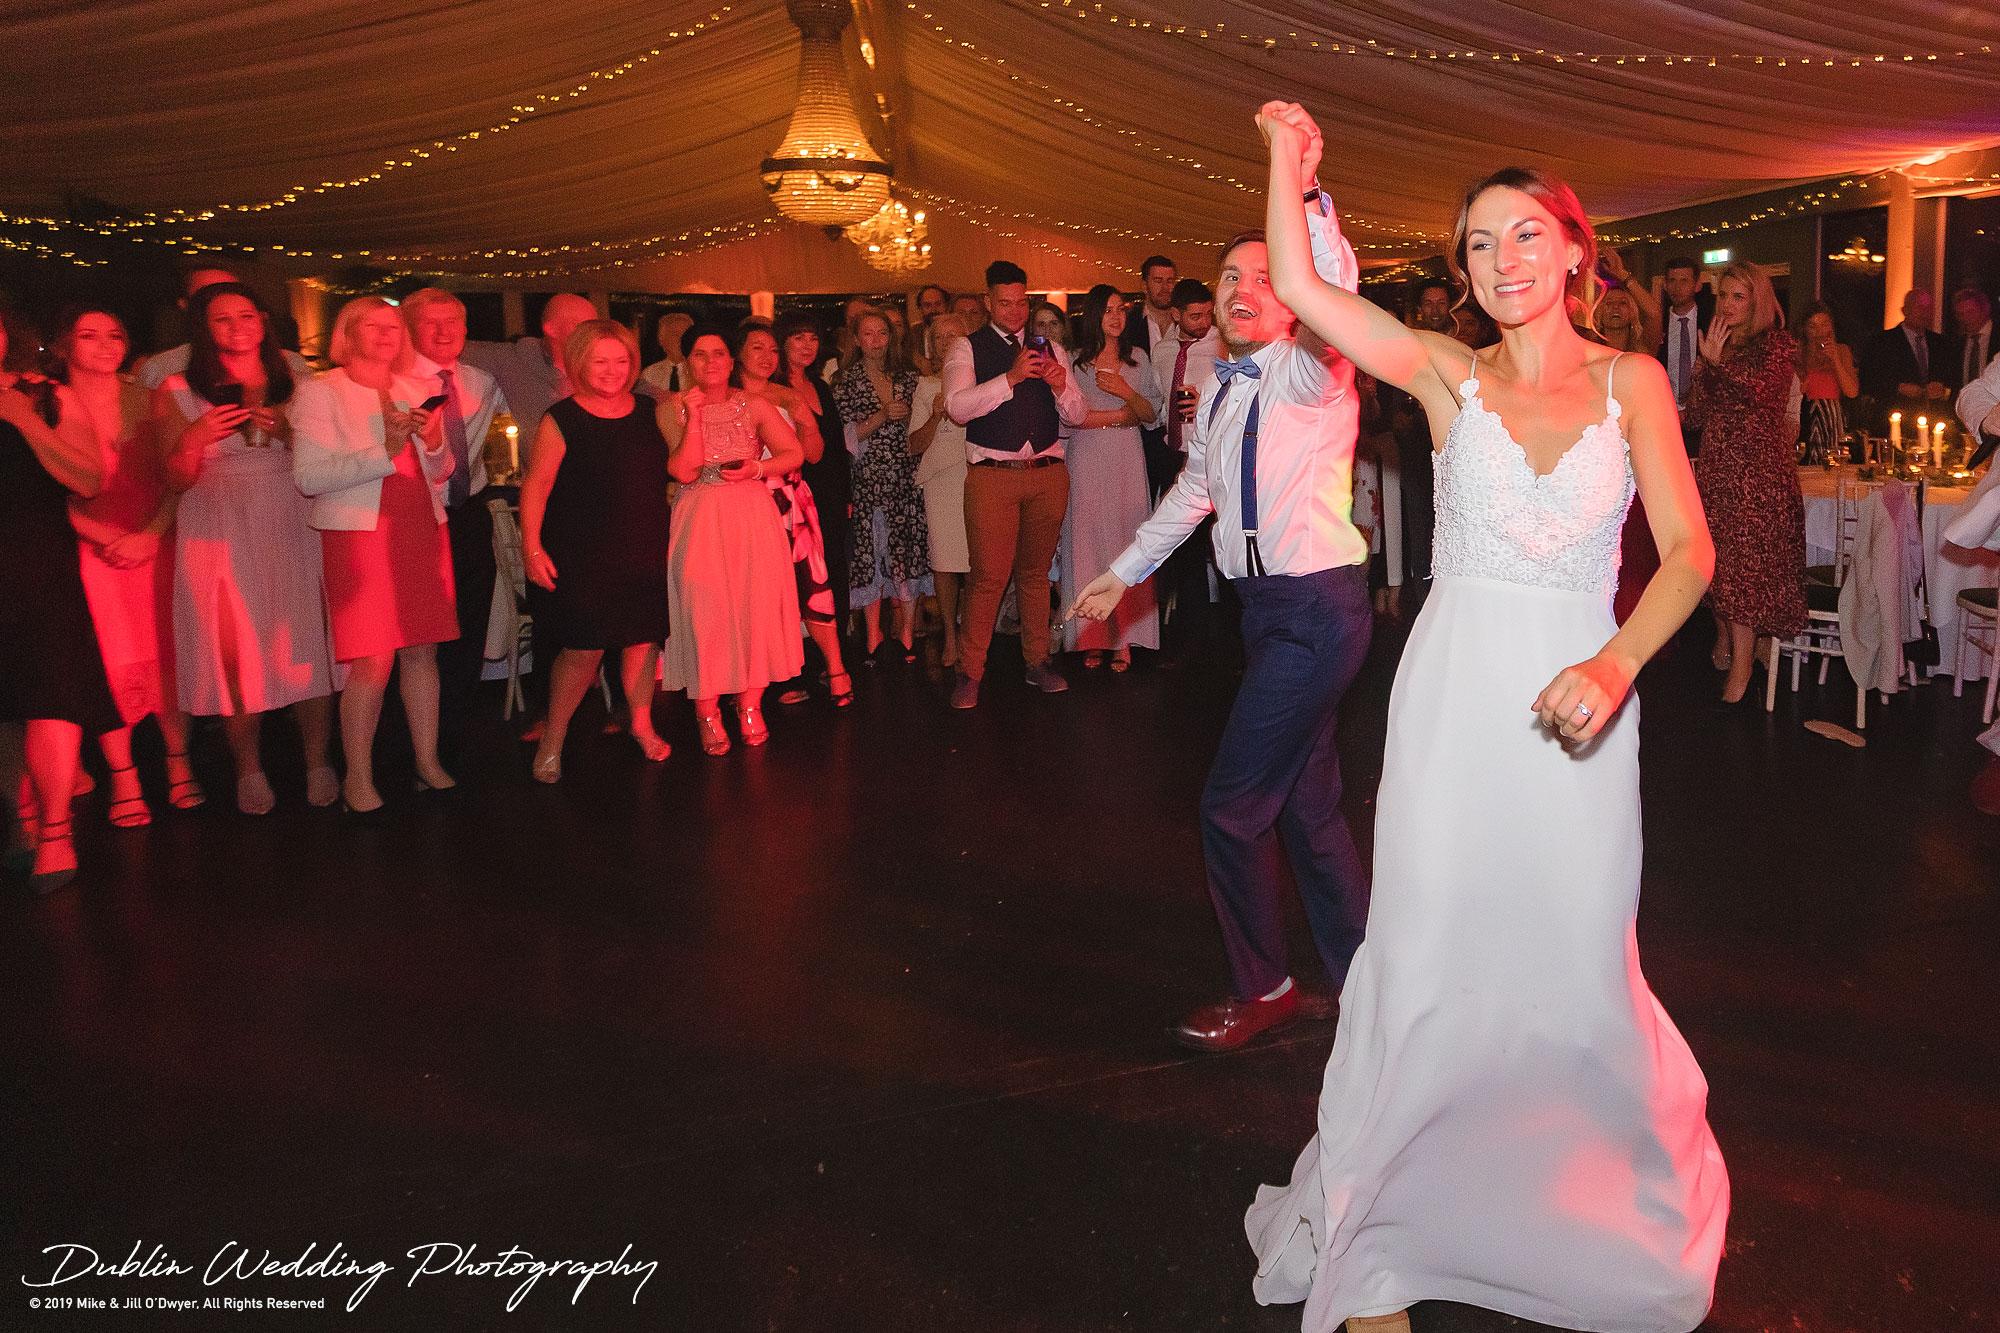 wedding-photographers-wicklow-tinakilly-house-2019-85.jpg